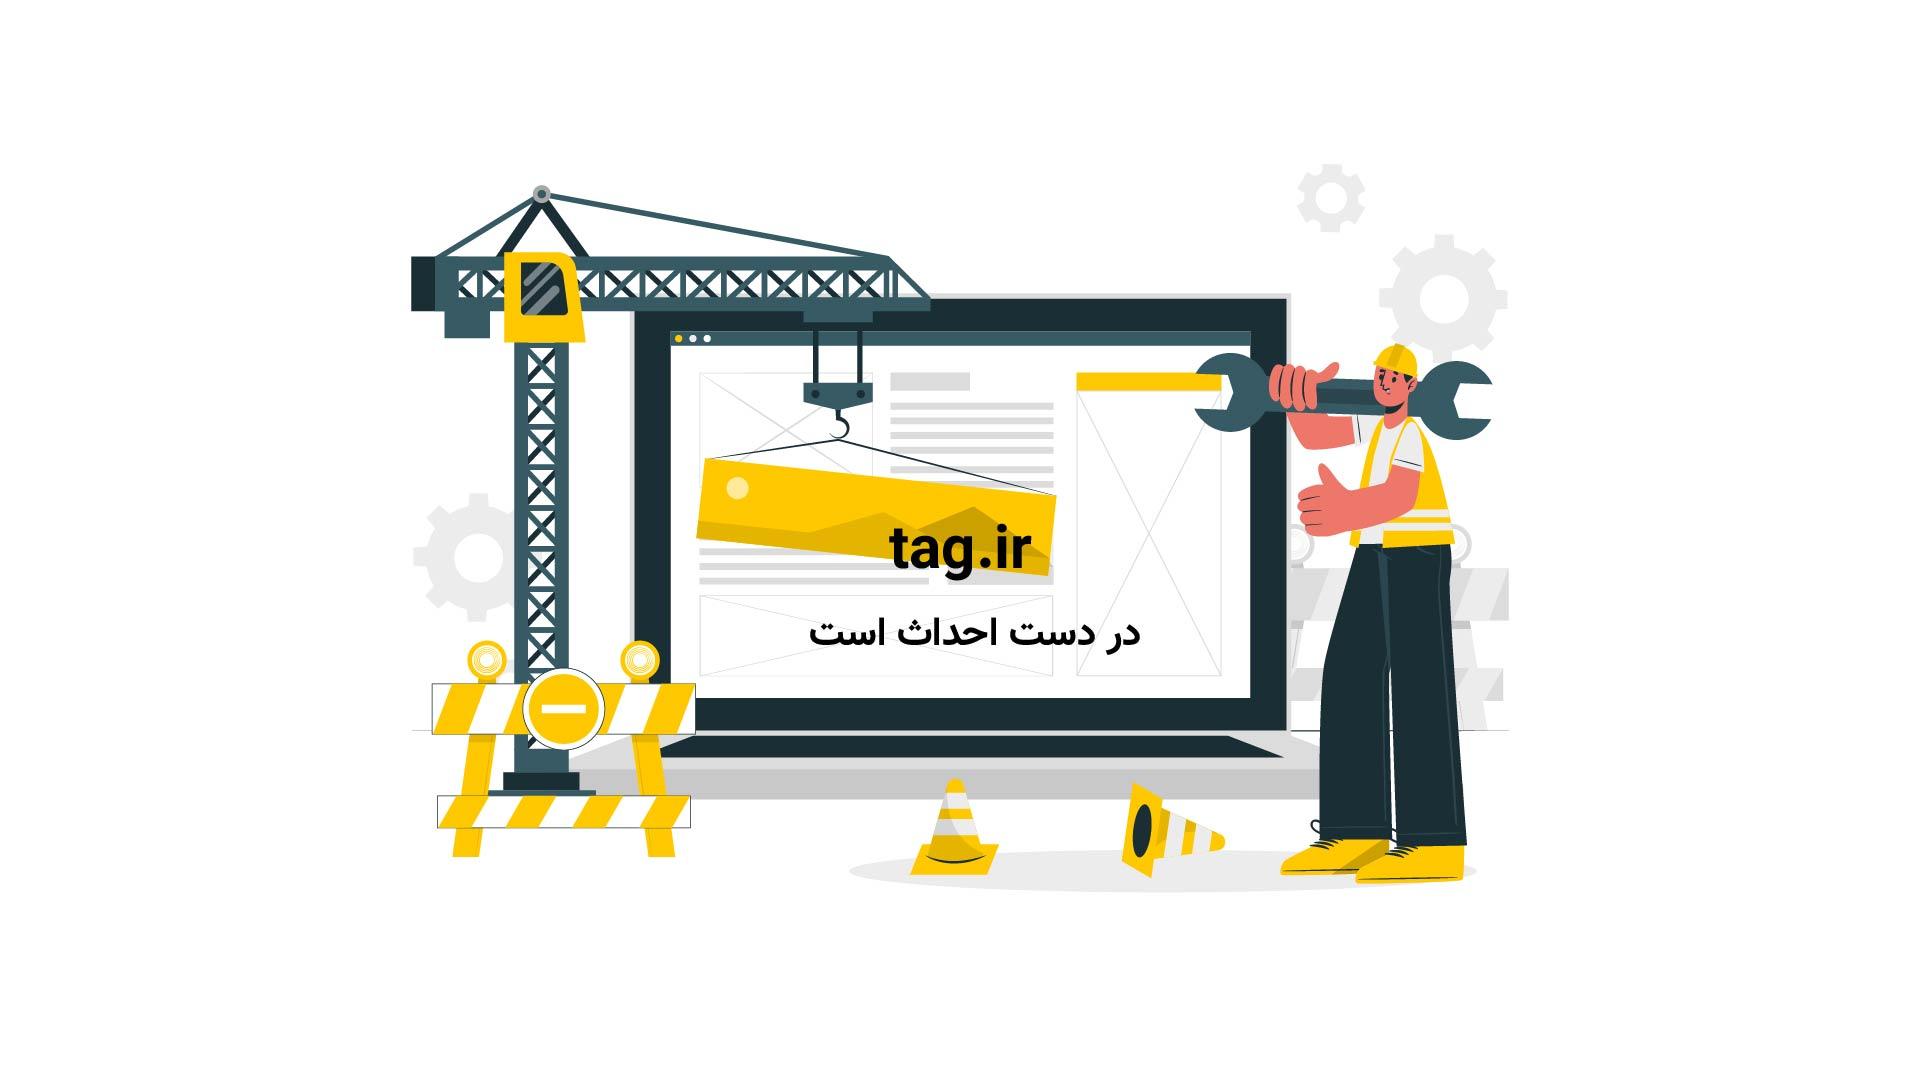 اوریگامی گنجشک   تگ